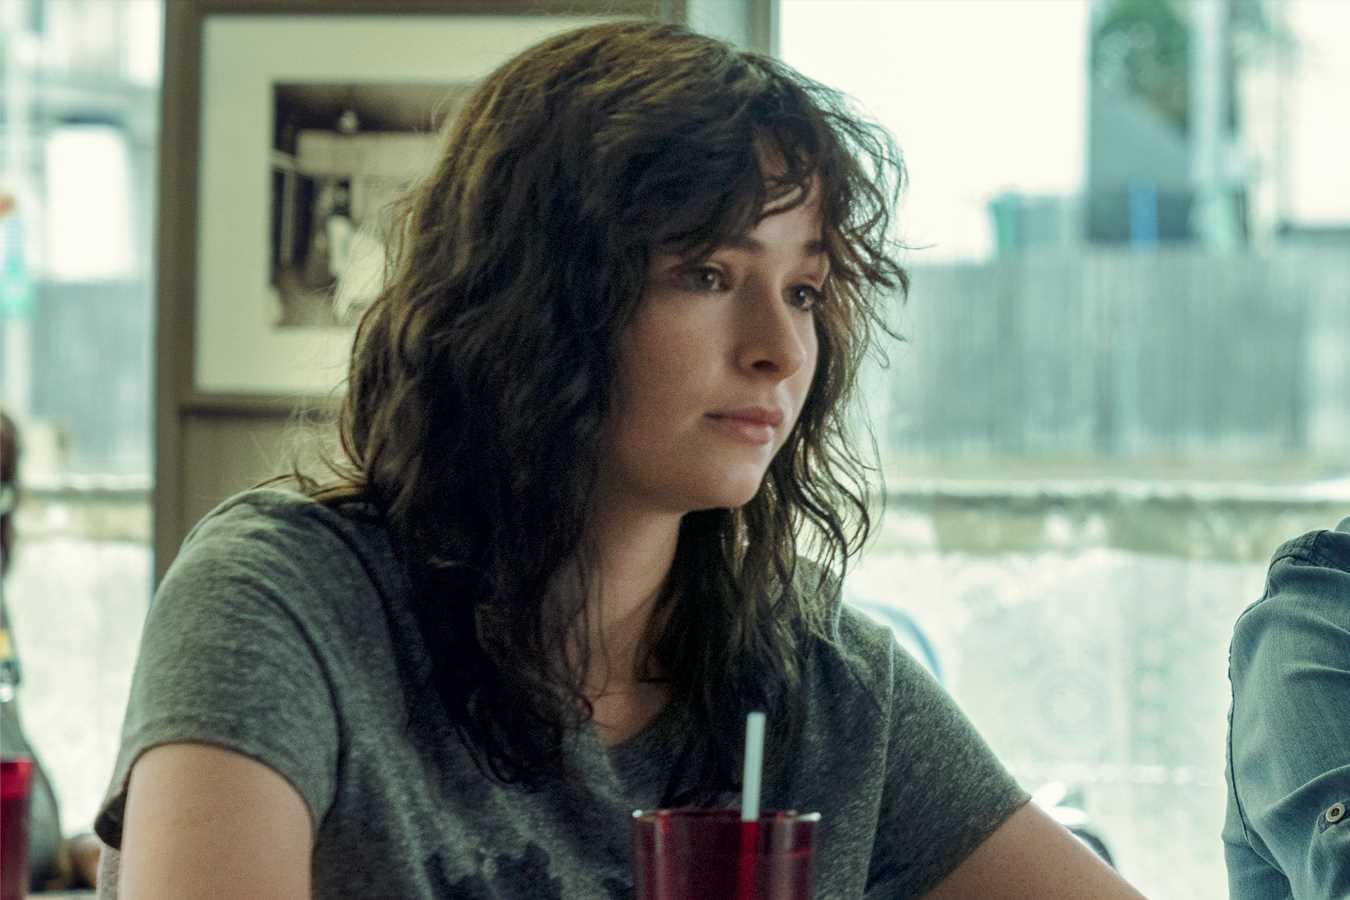 NOS4A2 star talks 'arduous' shoot for adaptation of Joe Hill's vampire novel